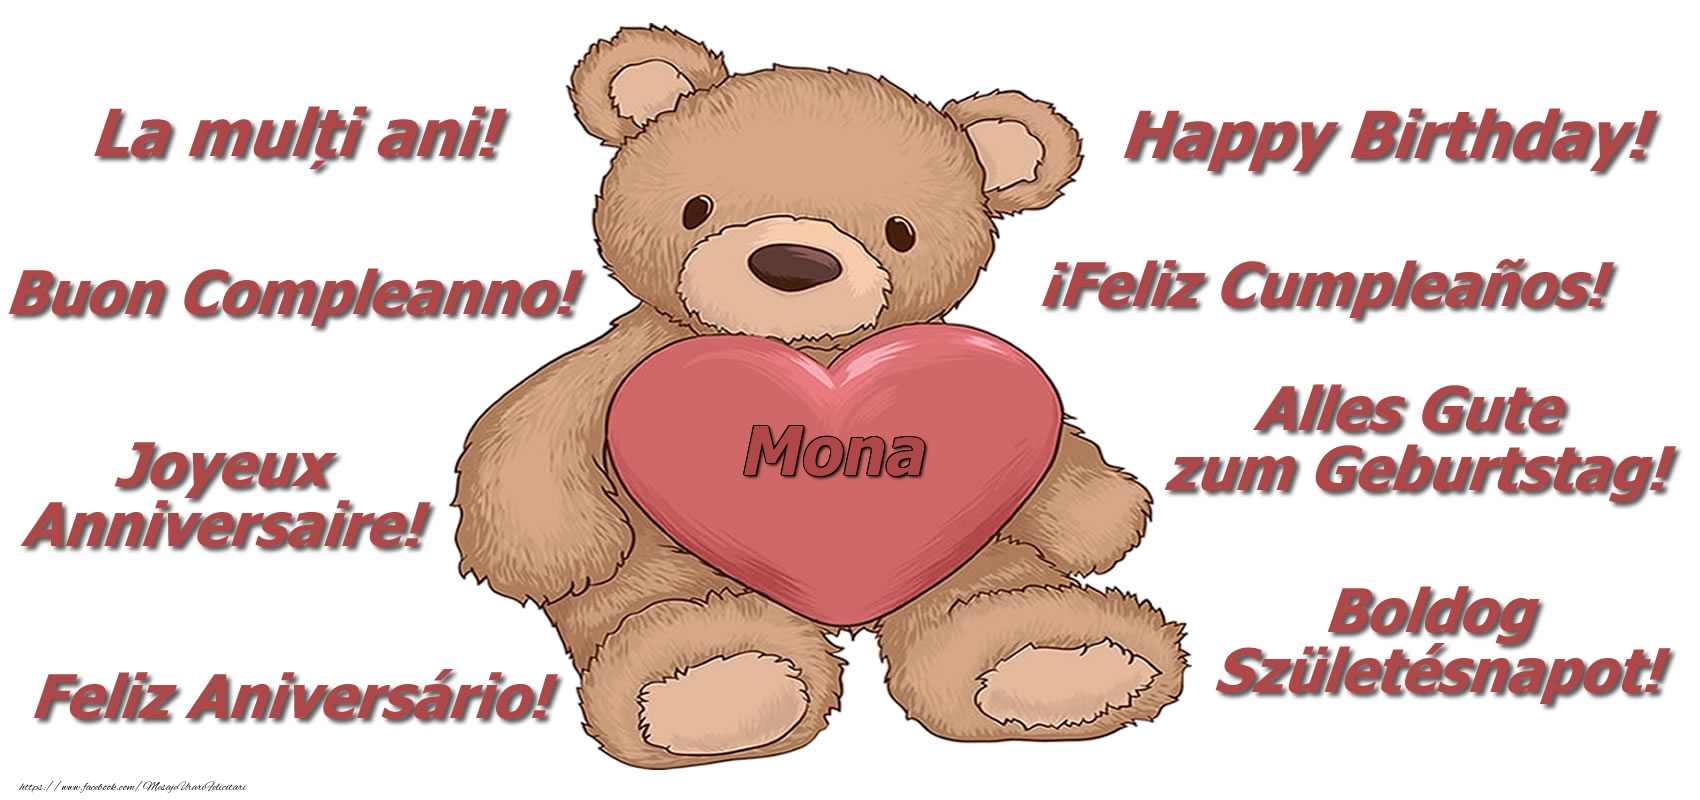 Felicitari de zi de nastere - La multi ani Mona! - Ursulet